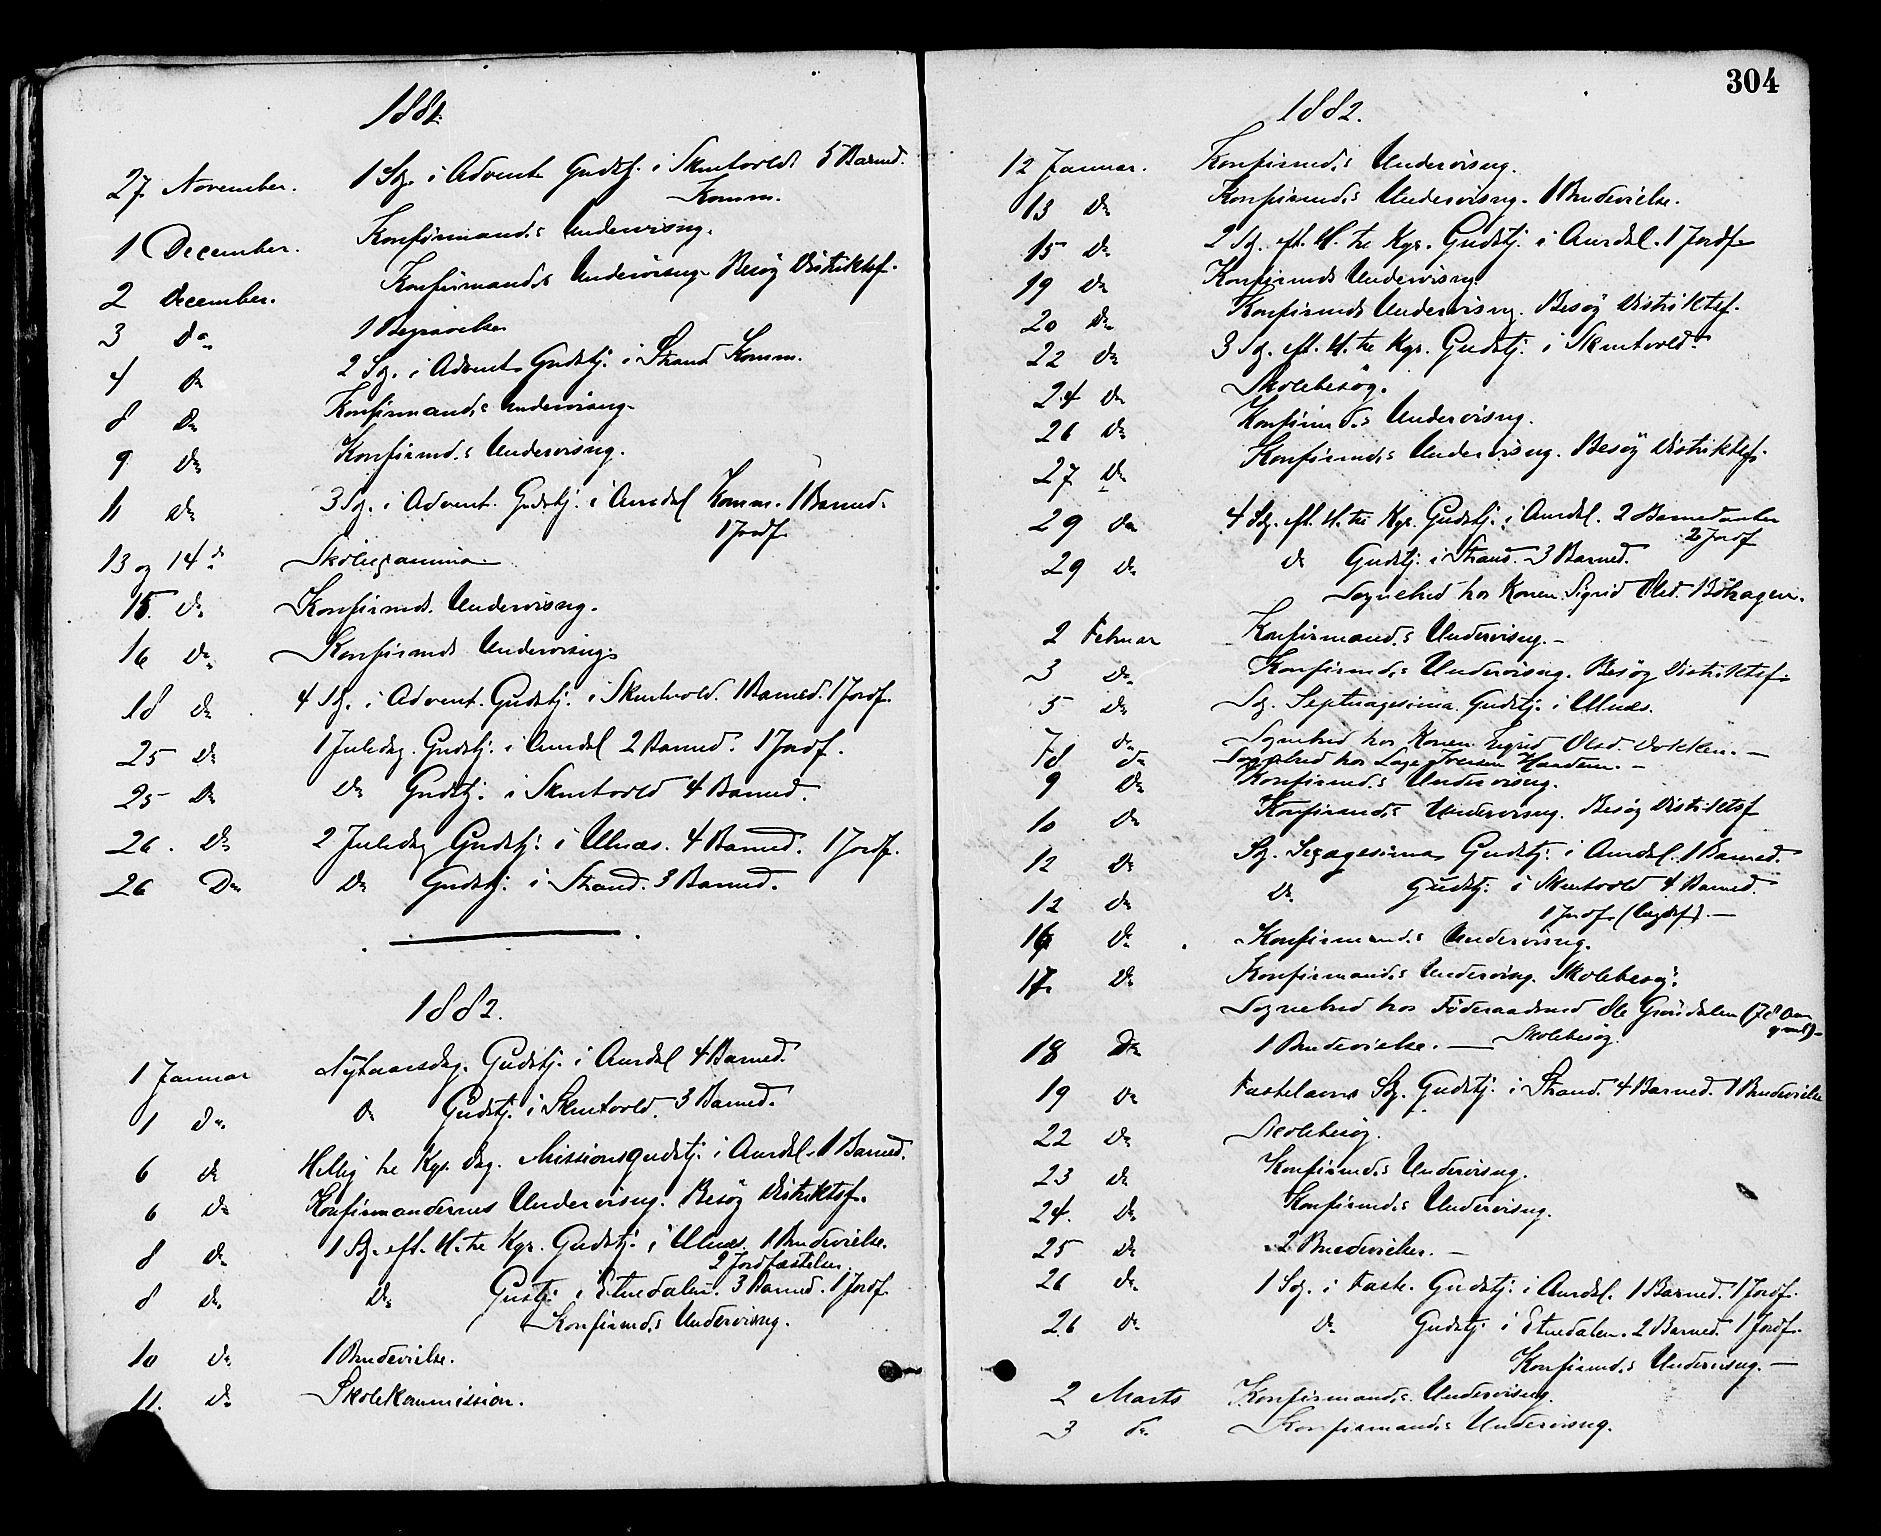 SAH, Nord-Aurdal prestekontor, Ministerialbok nr. 9, 1876-1882, s. 304